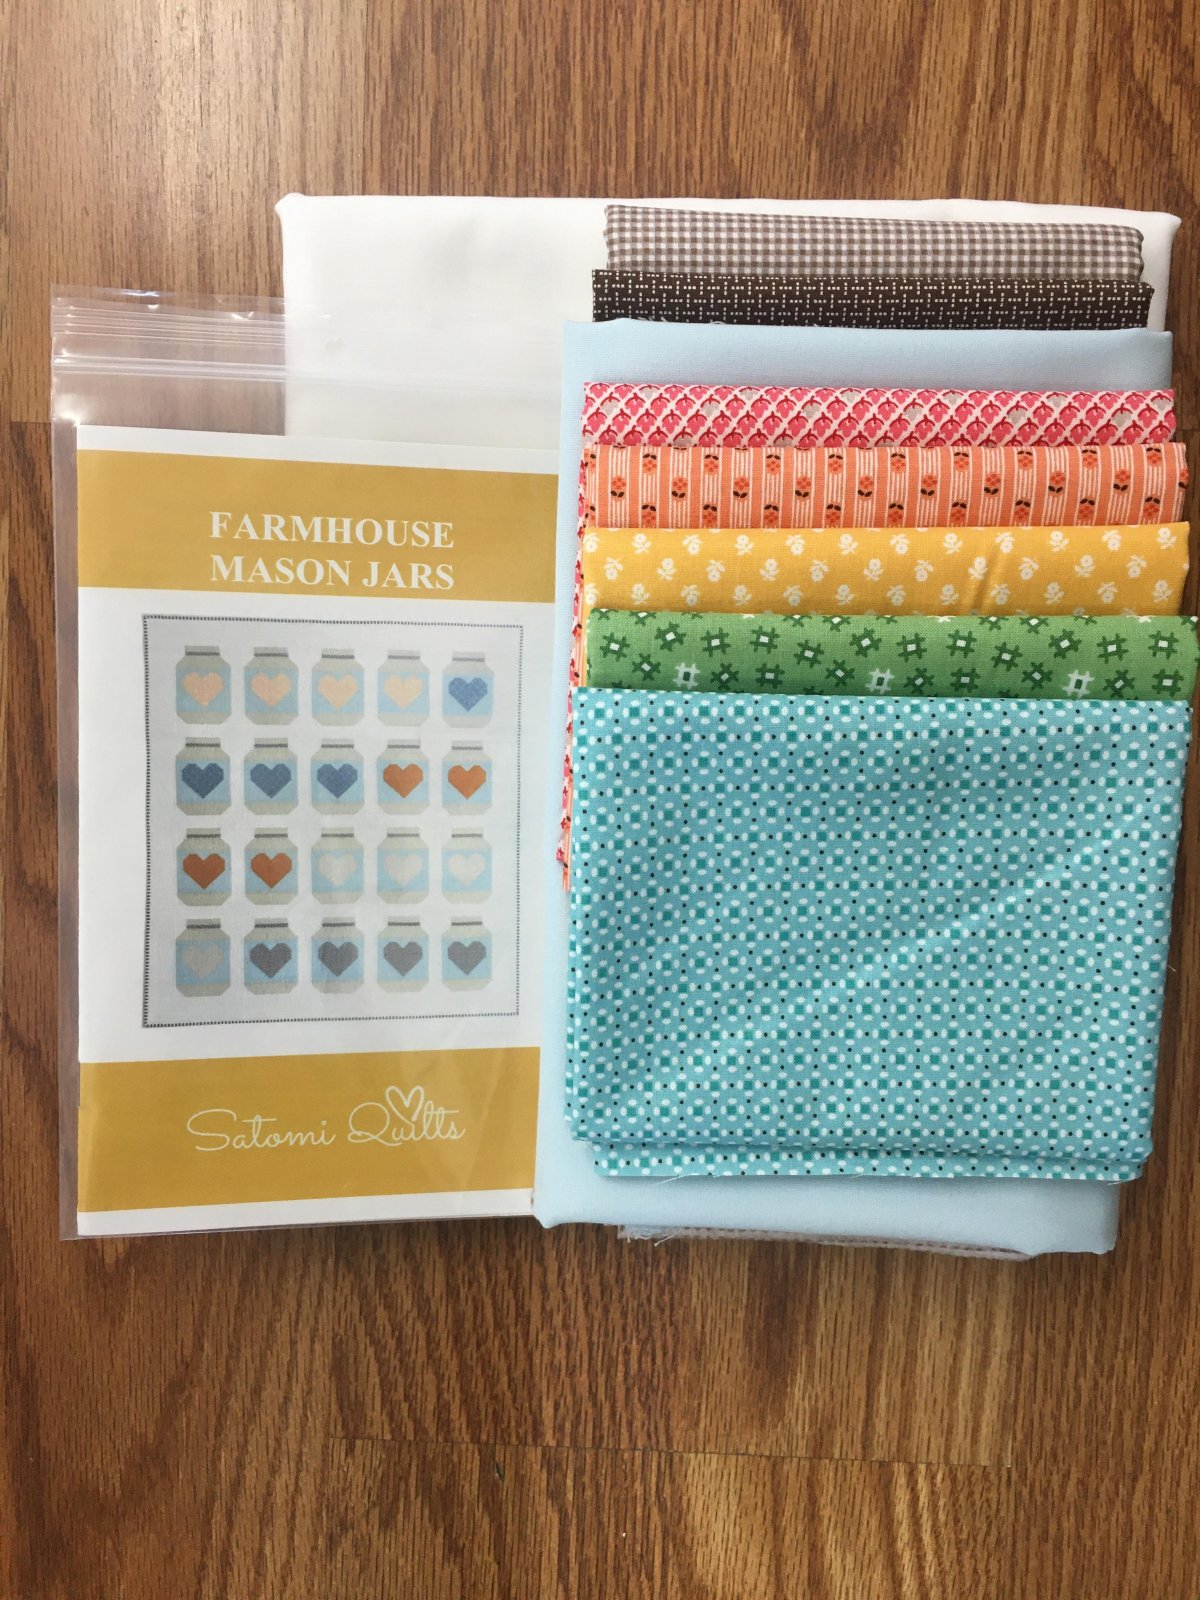 Farmhouse Mason Jars